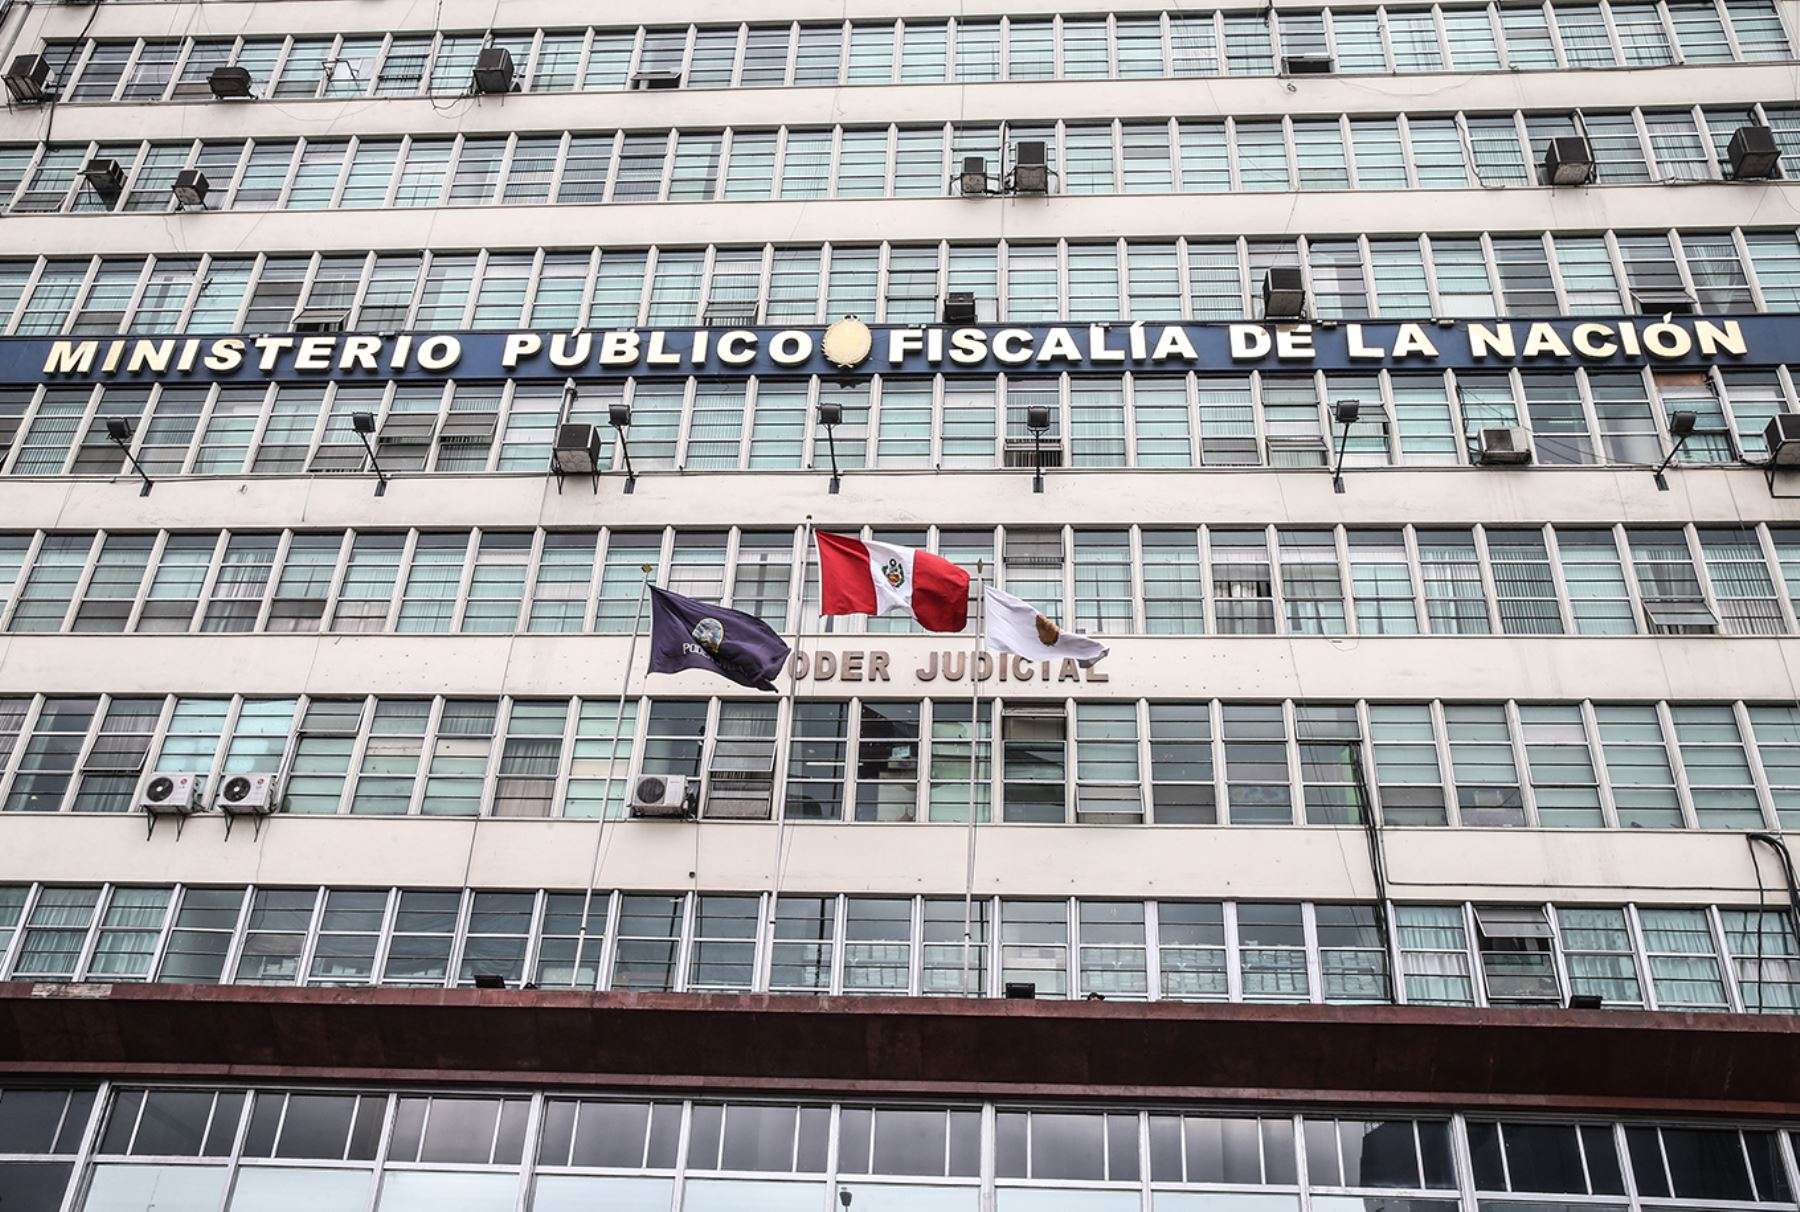 Control interno del ministerio p blico investigar caso de for Ministerio de seguridad telefonos internos